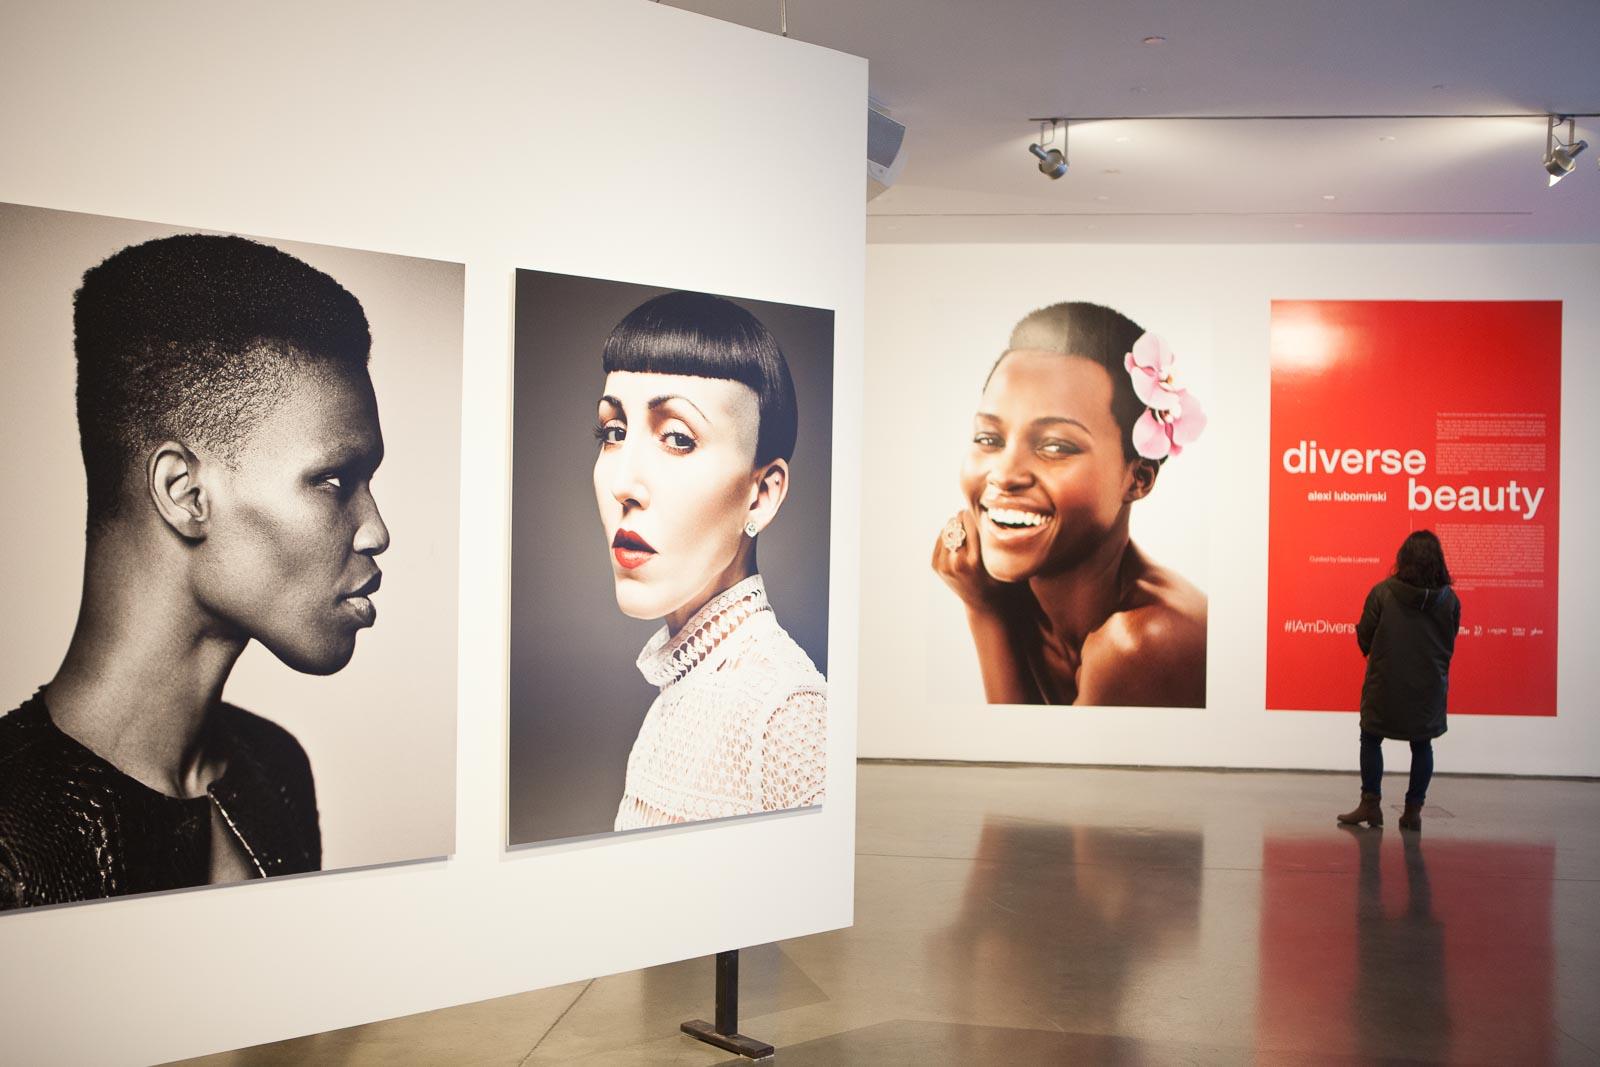 alexi-lubomirski-diverse-beauty-exhibition-robertiaga-6